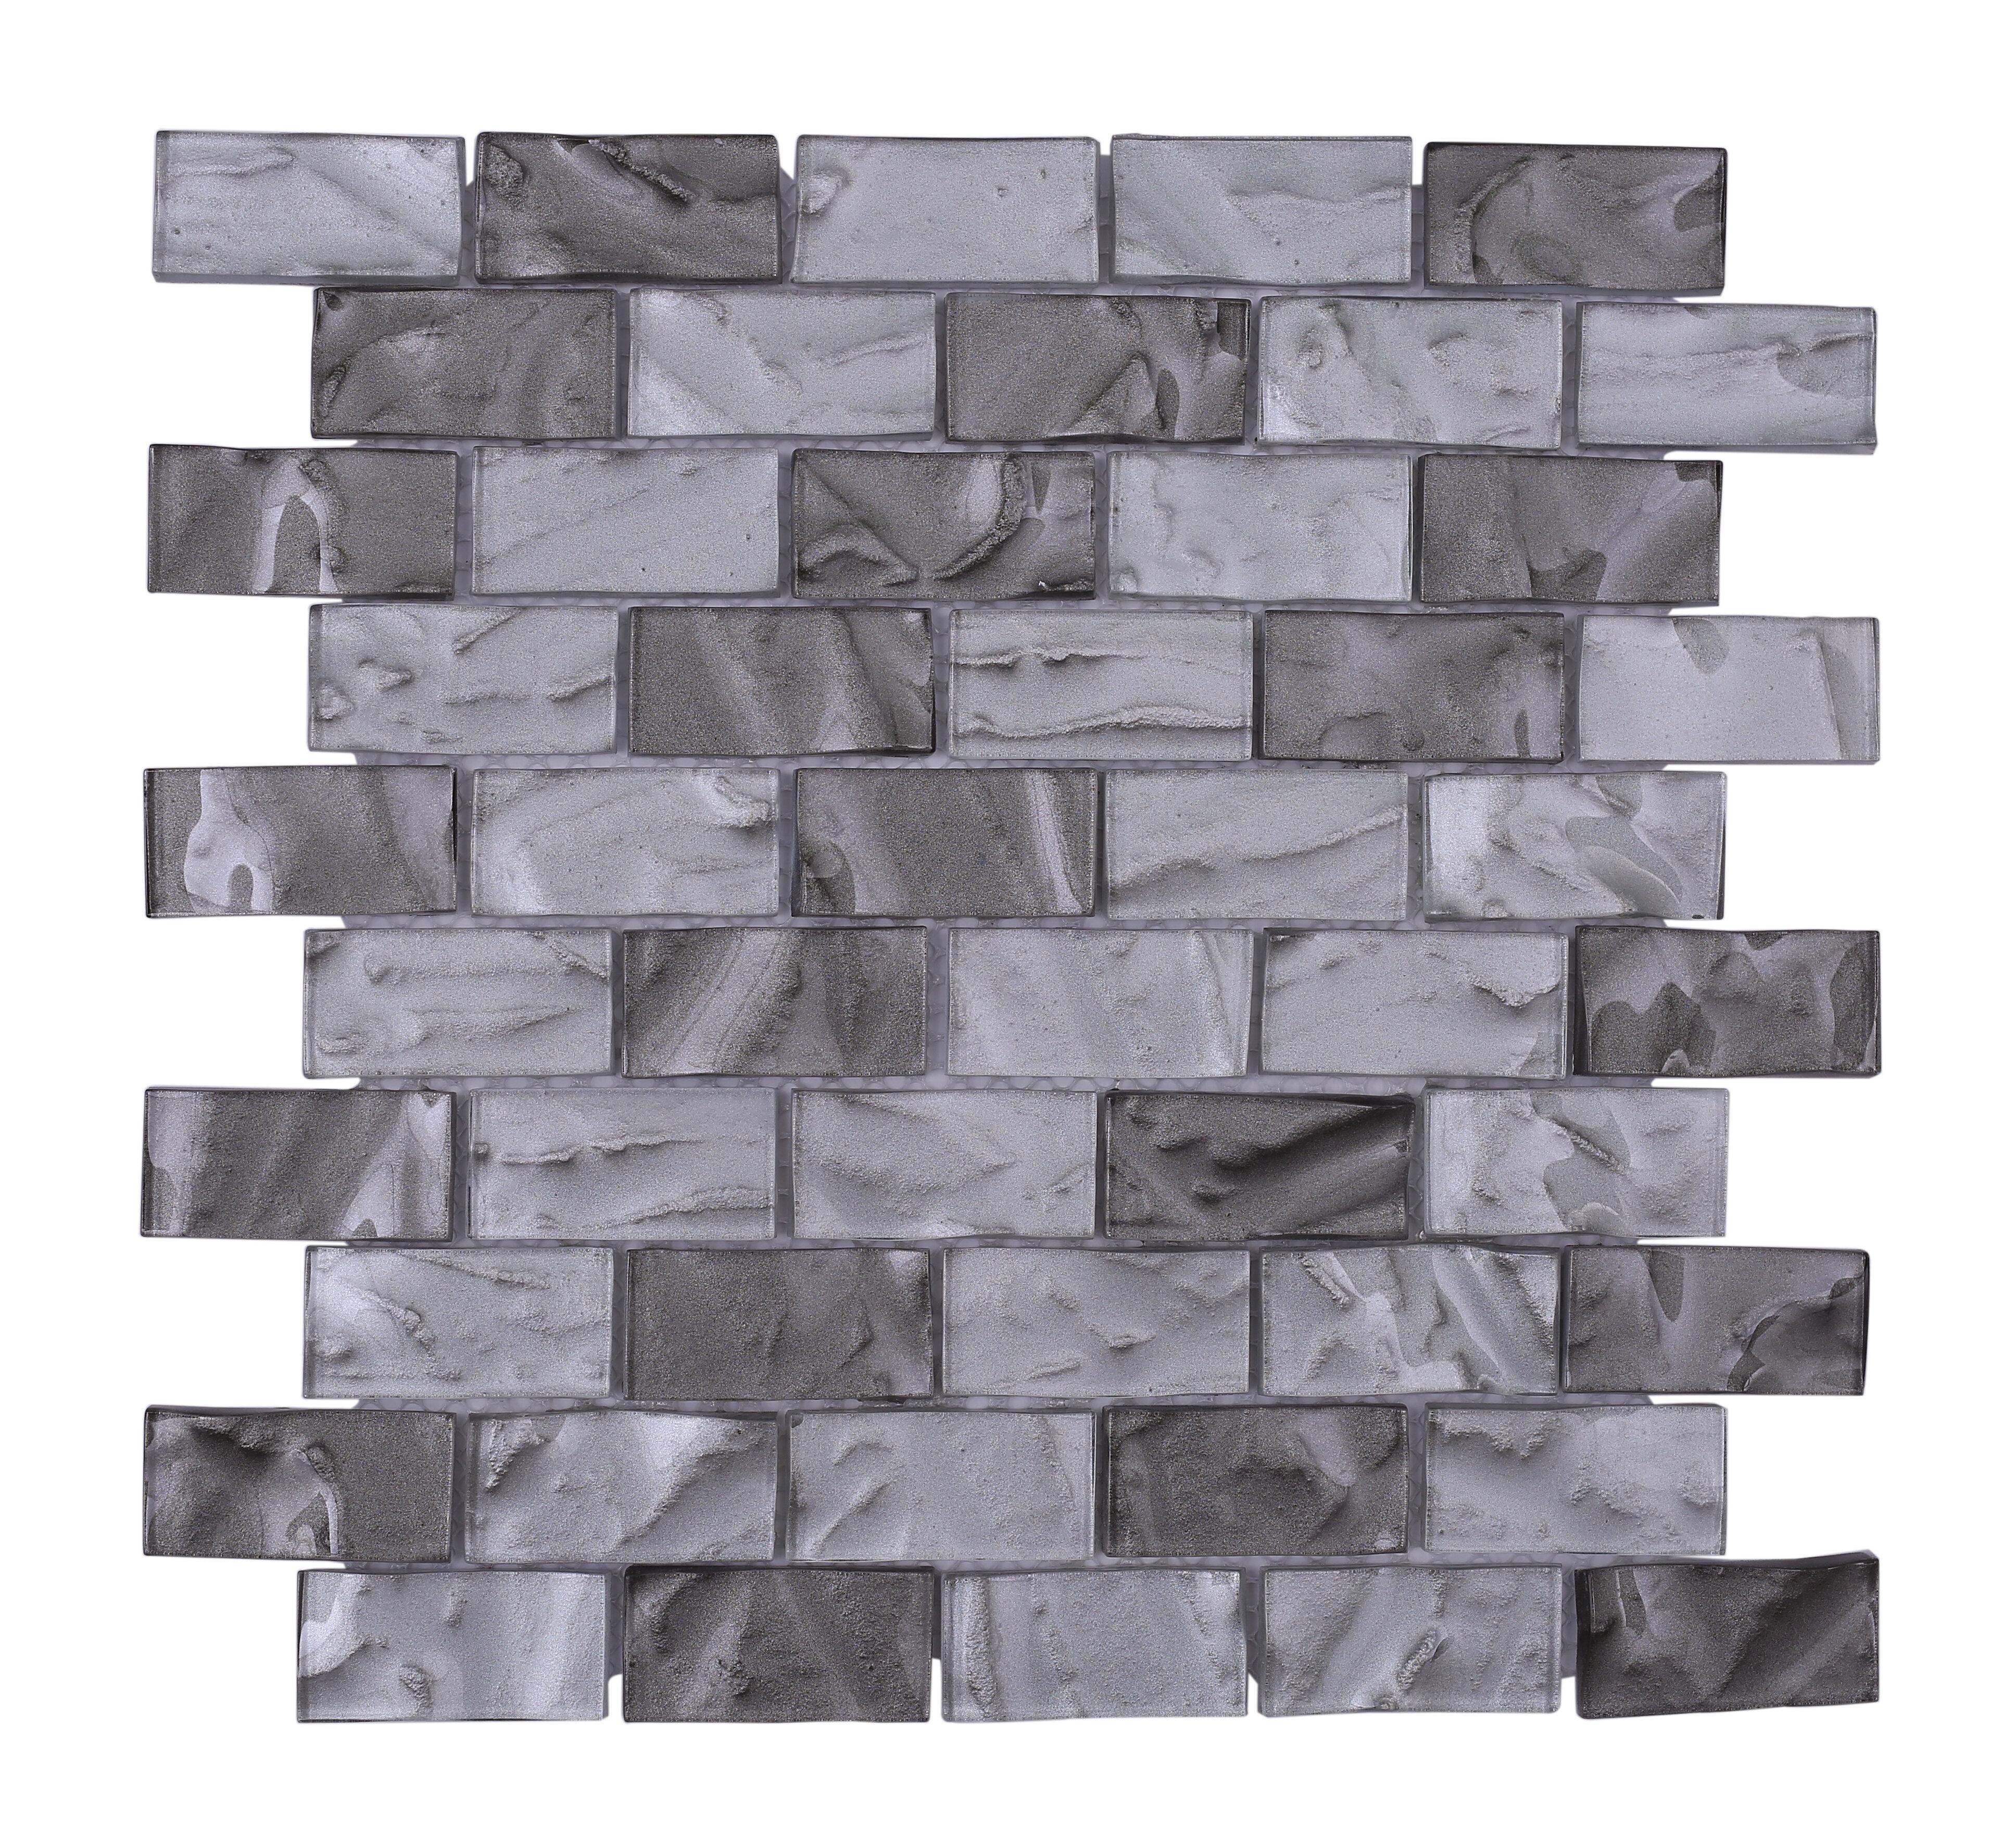 Vetromani Barcelona 3d Wavy Brick 1 X 2 Glass Subway Tile In Gray